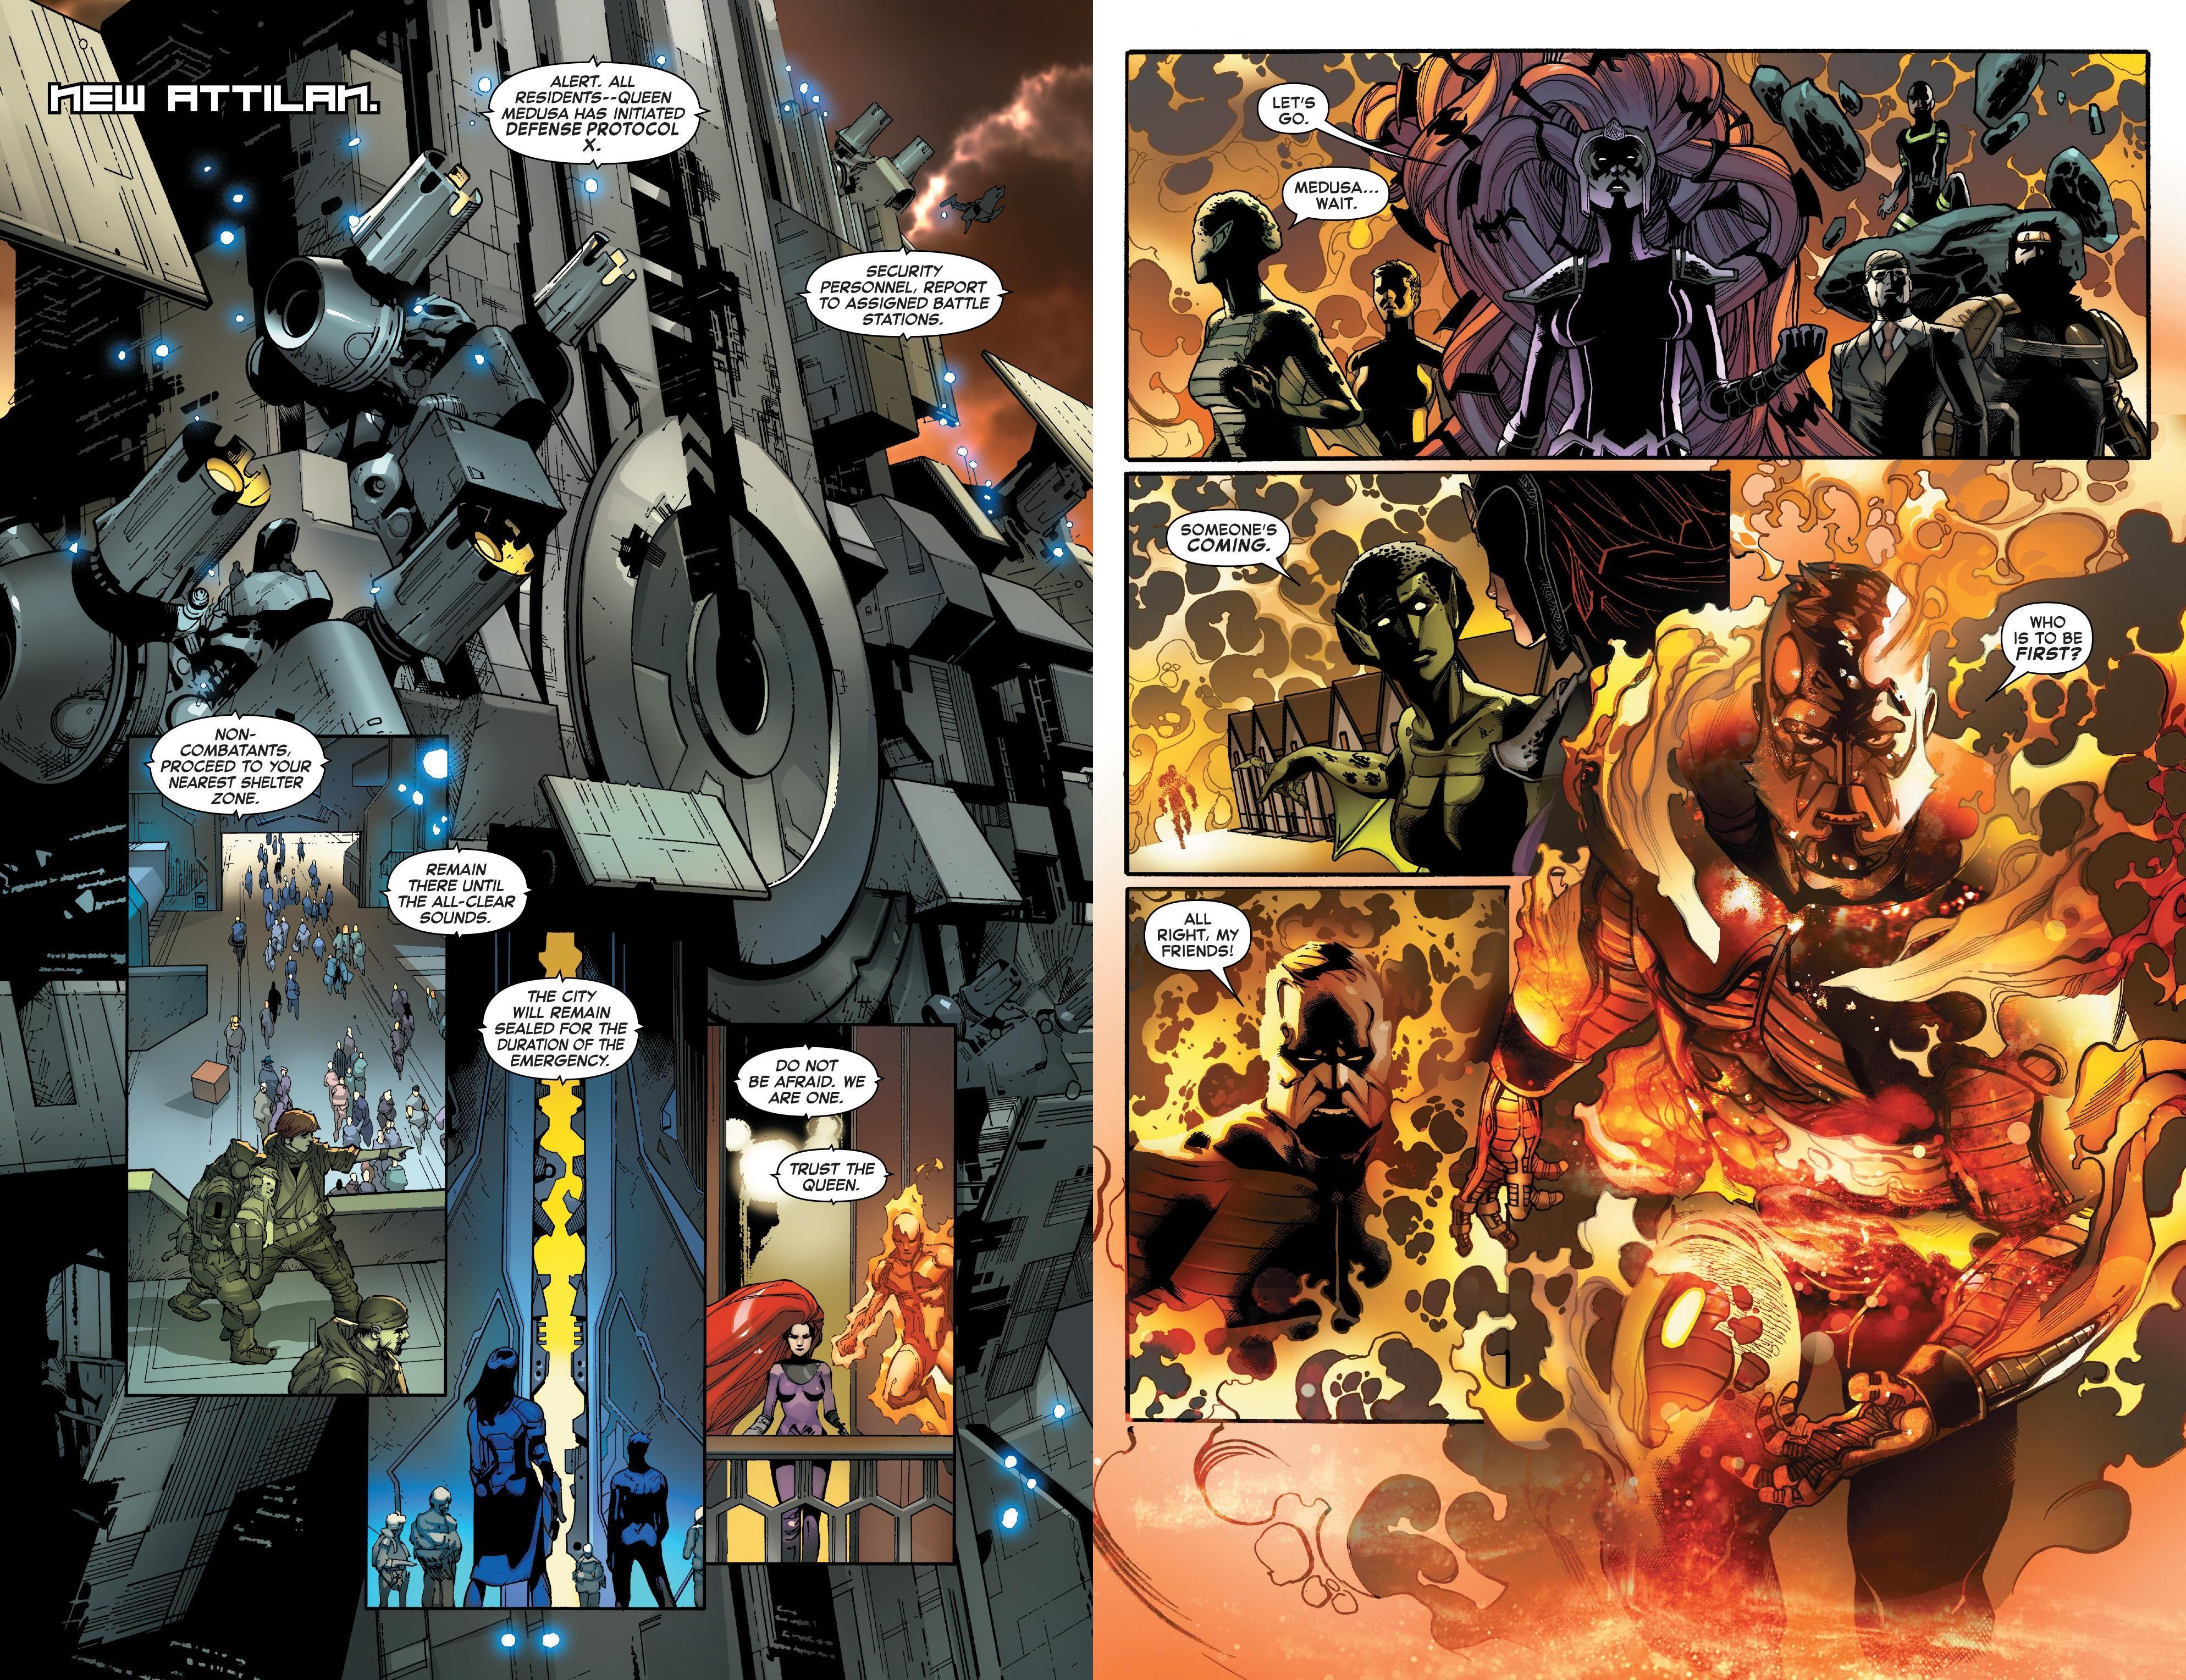 Inhumans vs X-Men review